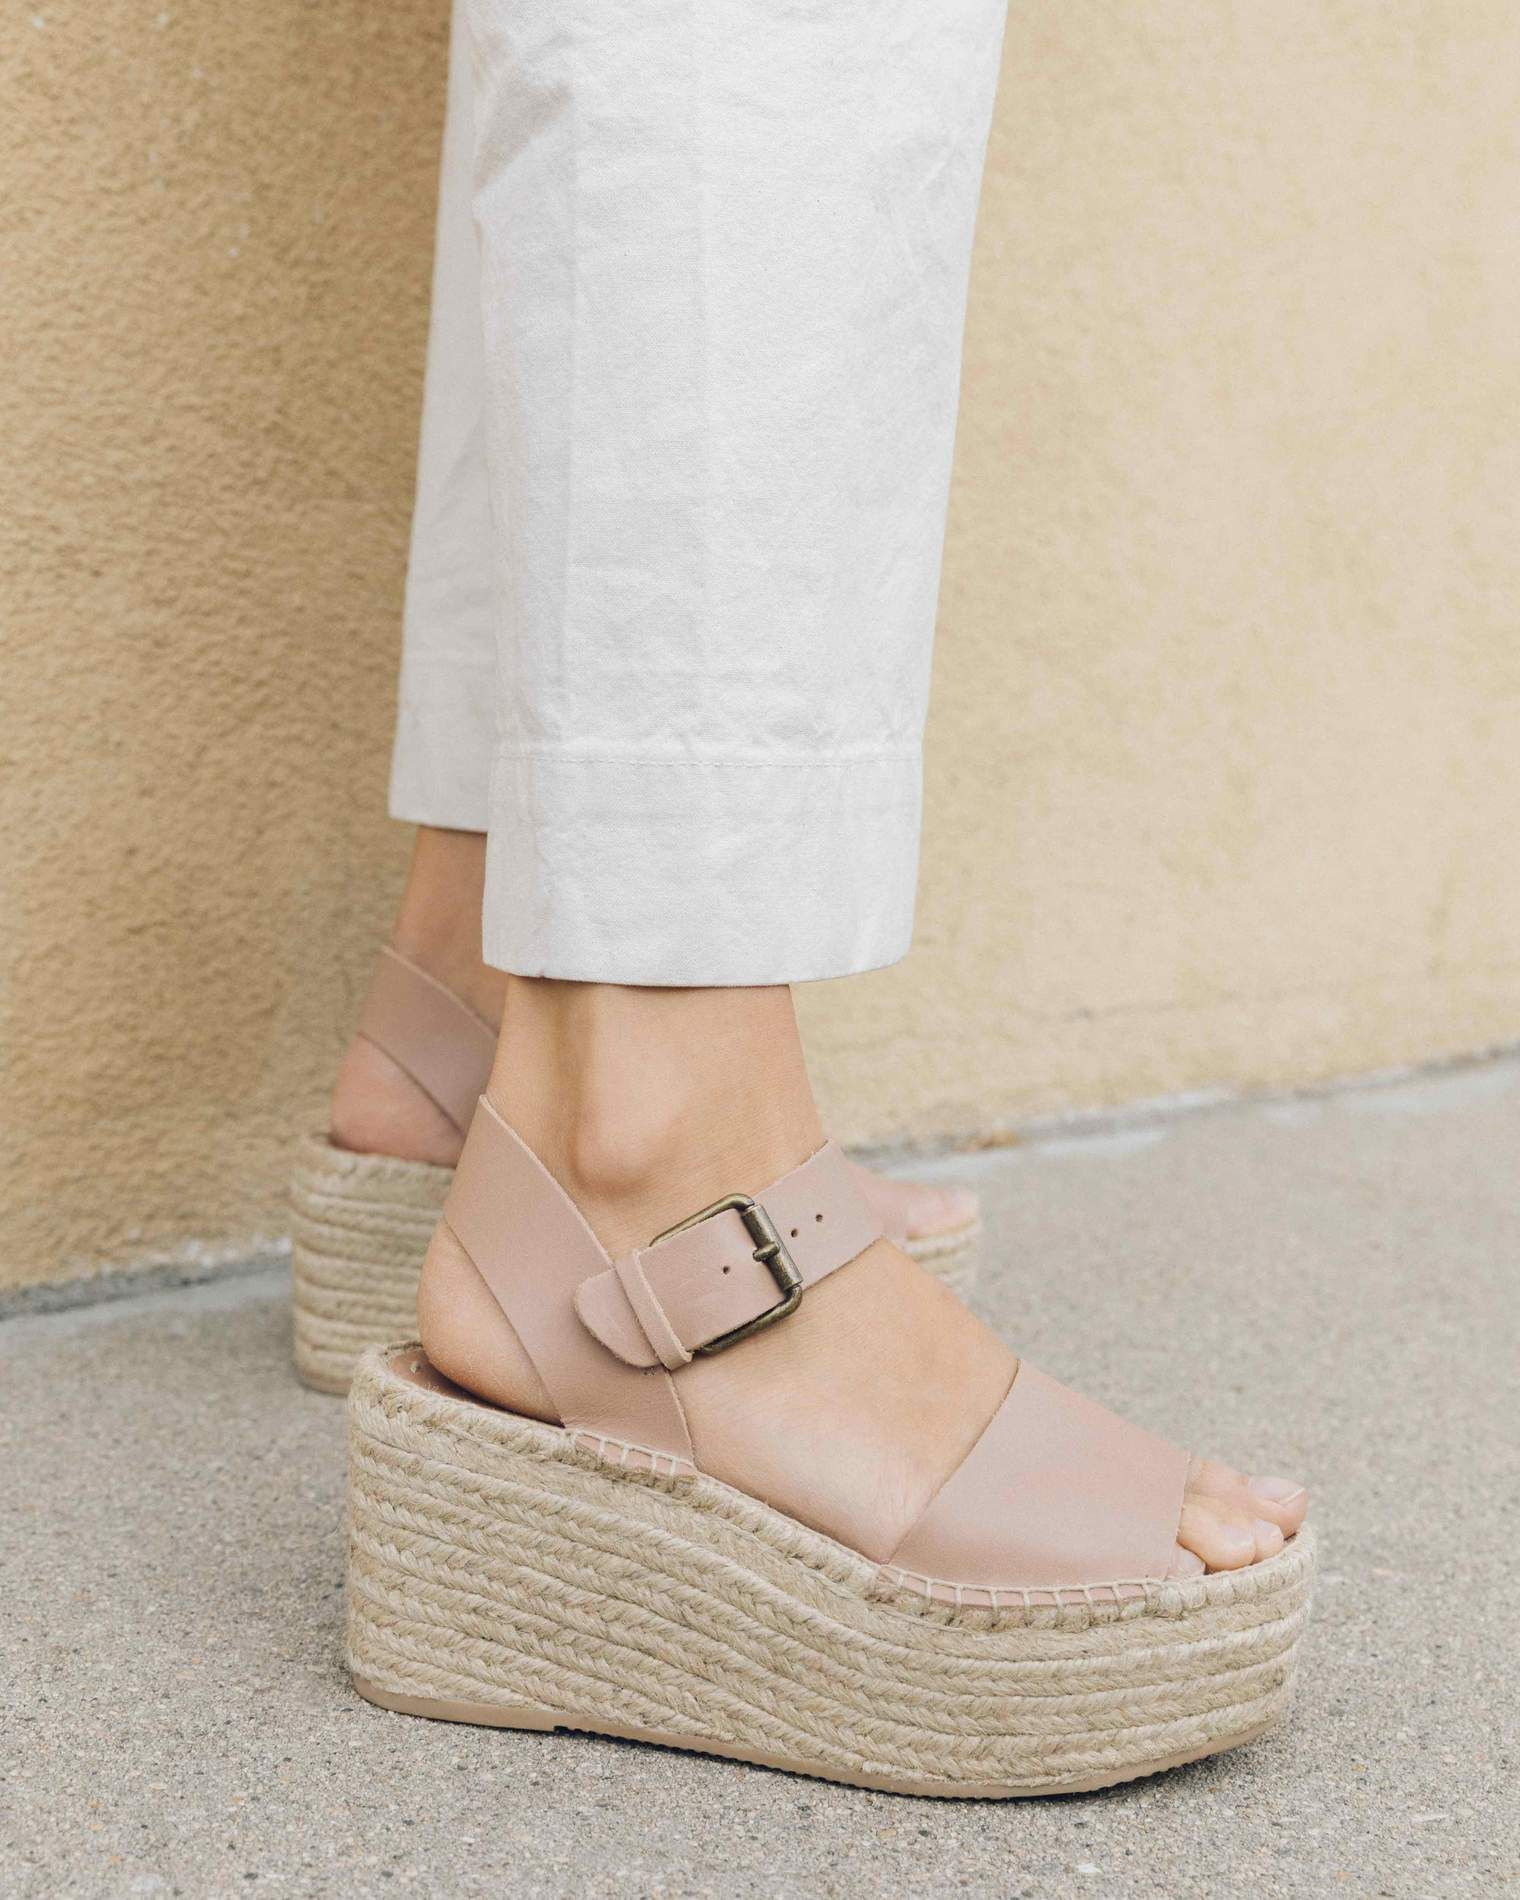 Minorca High Platform | Women shoes